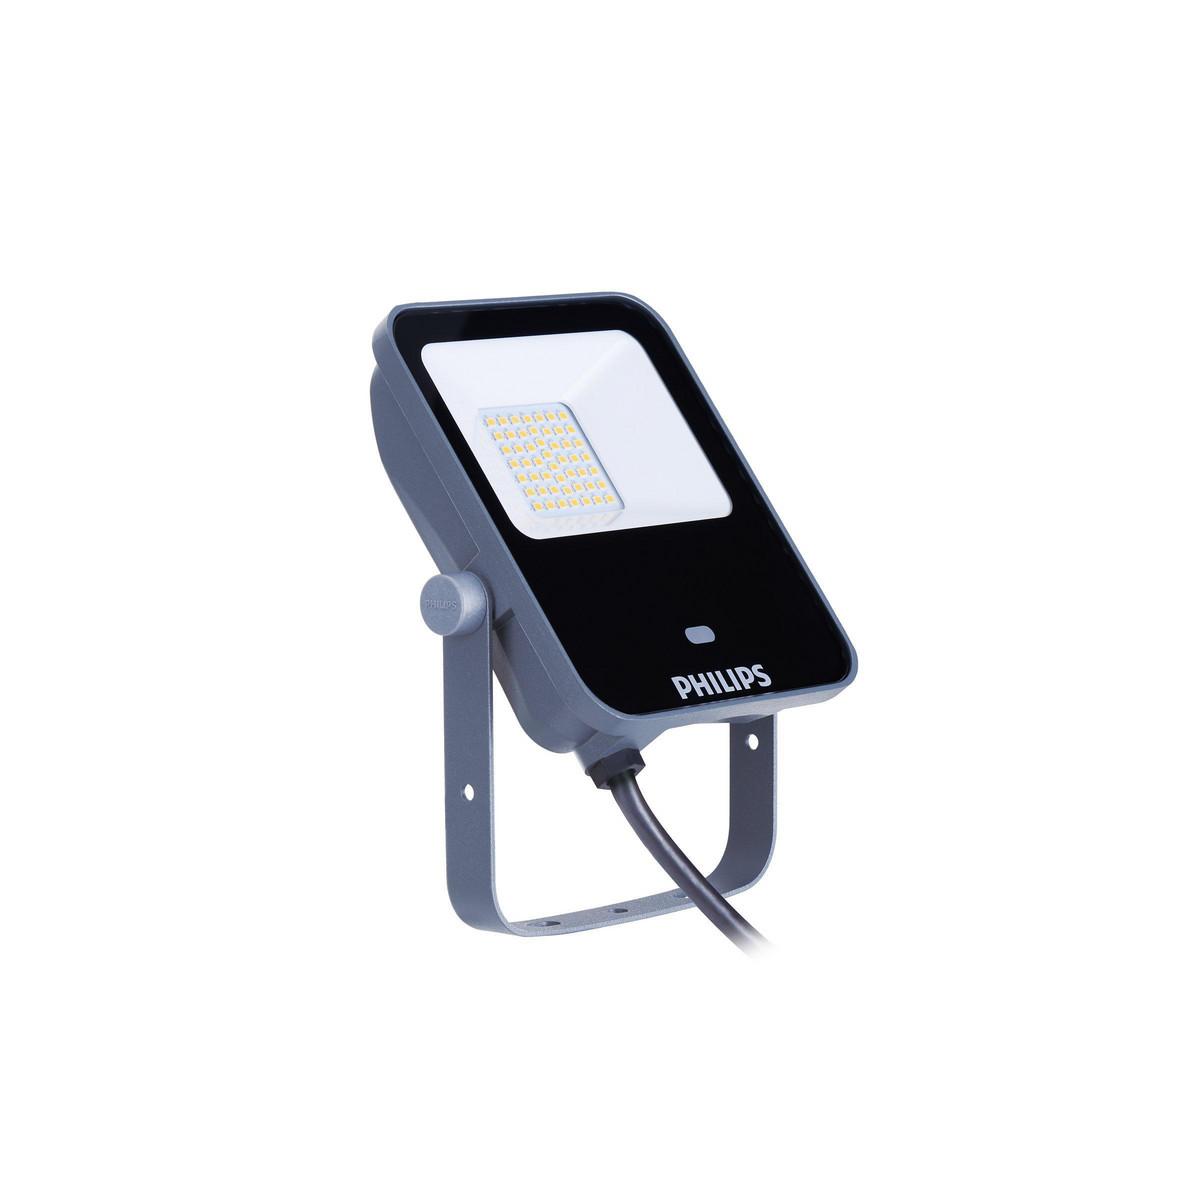 Ledinaire Projektør Gen2 Lille BVP154 LED 2000lm/830 20W Meget bredstrålende (VWB) Mikrobølgesensor